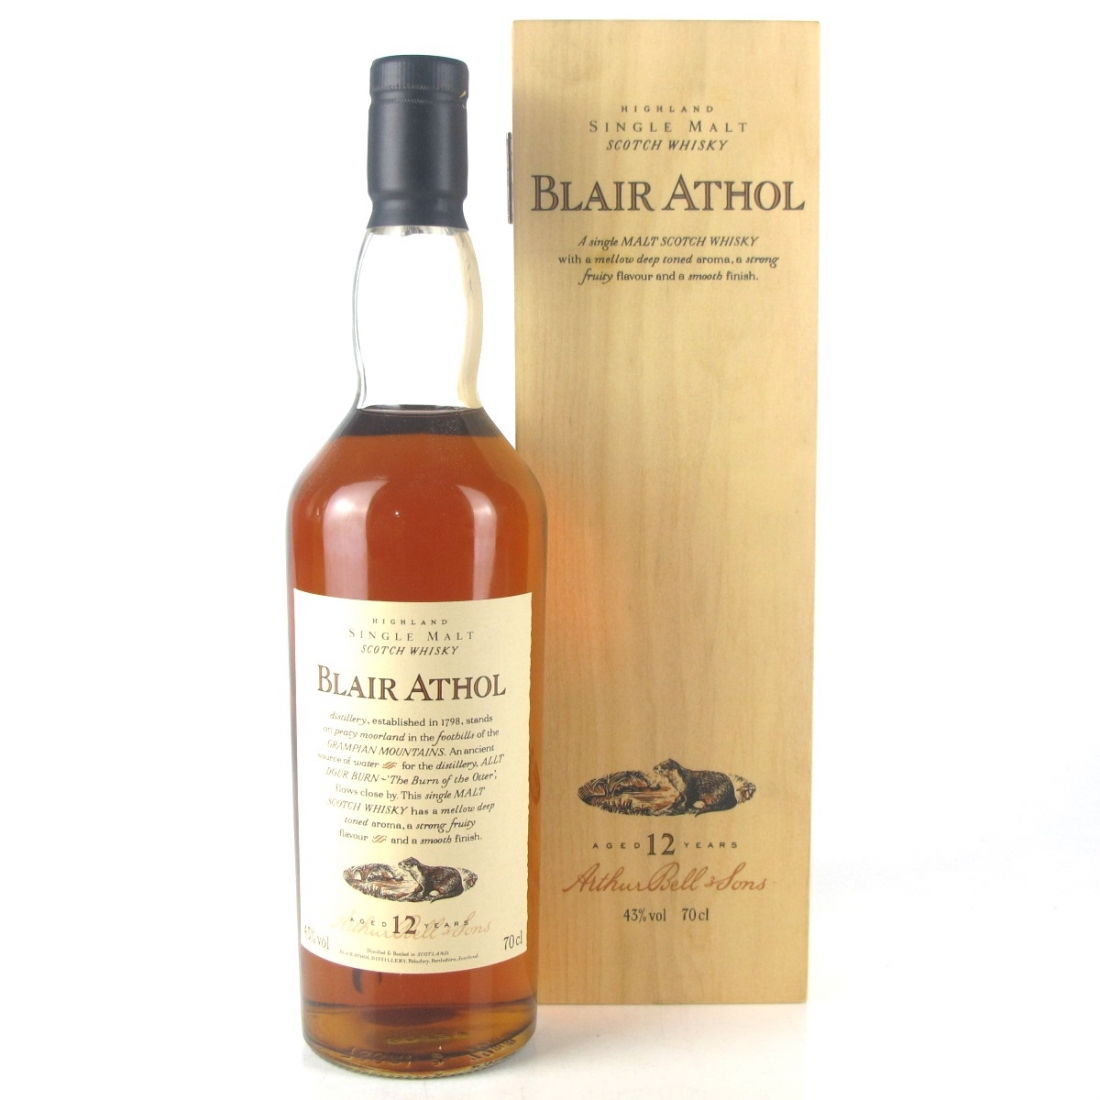 Blair Athol 12 Year Old Flora and Fauna / Wooden Box